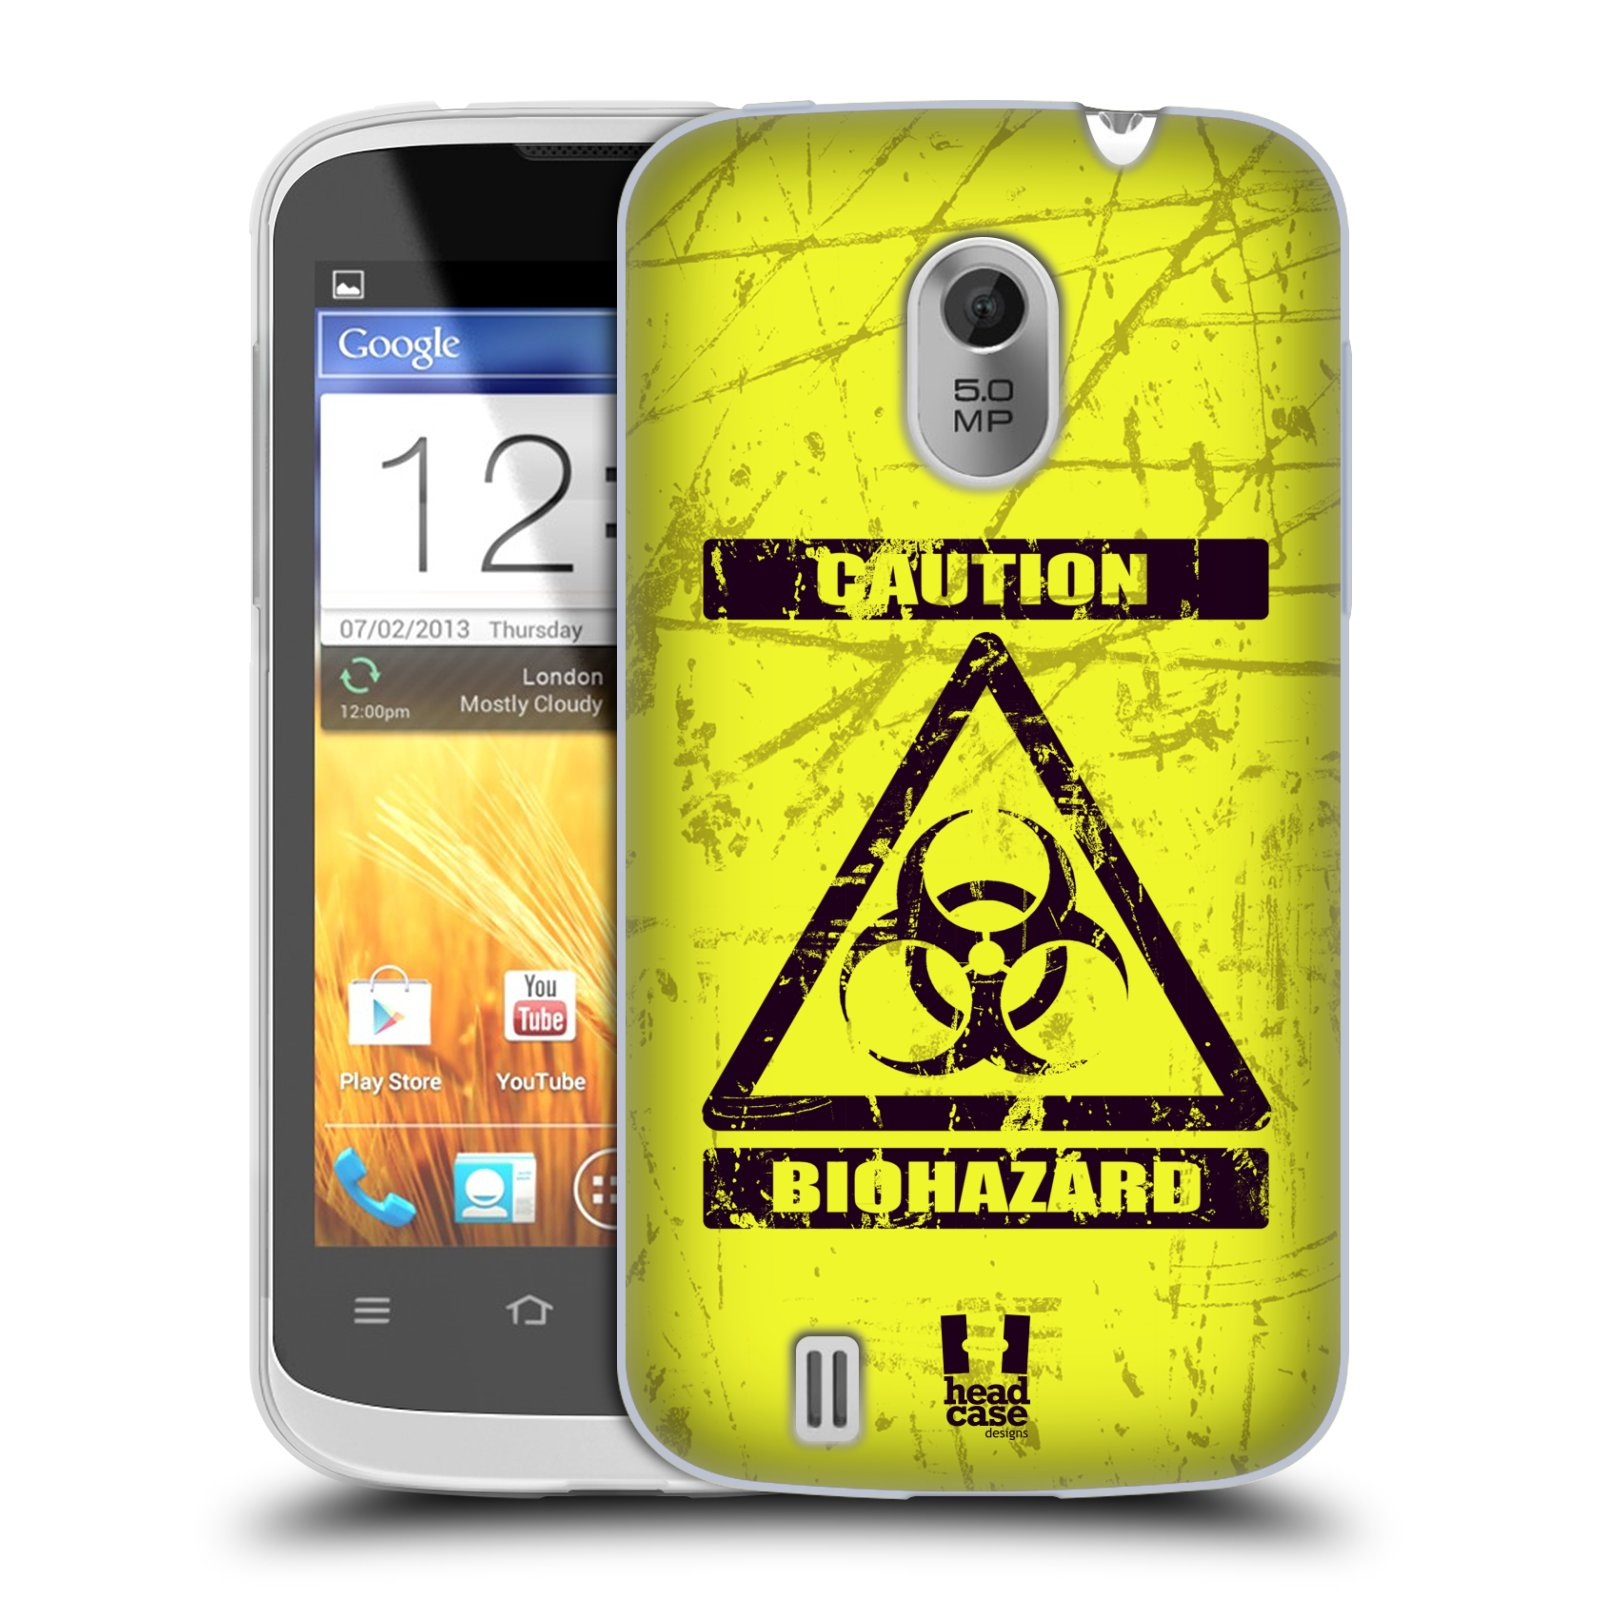 Silikonové pouzdro na mobil ZTE Blade III HEAD CASE BIOHAZARD (Silikonový kryt či obal na mobilní telefon ZTE Blade 3)